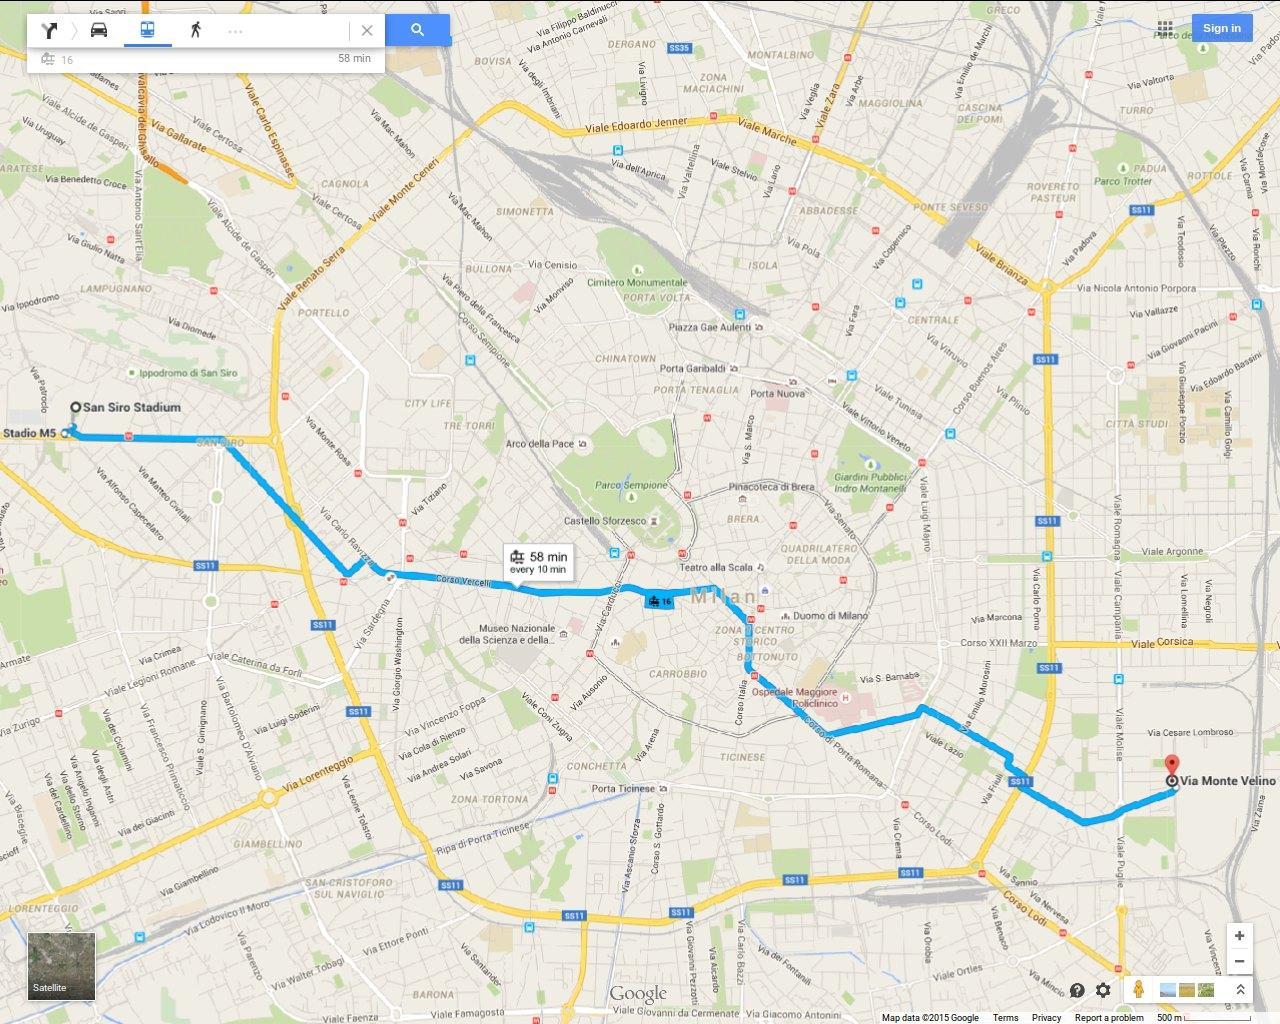 Milan finally Tram 16 direct to the San Siro Stadium passing the